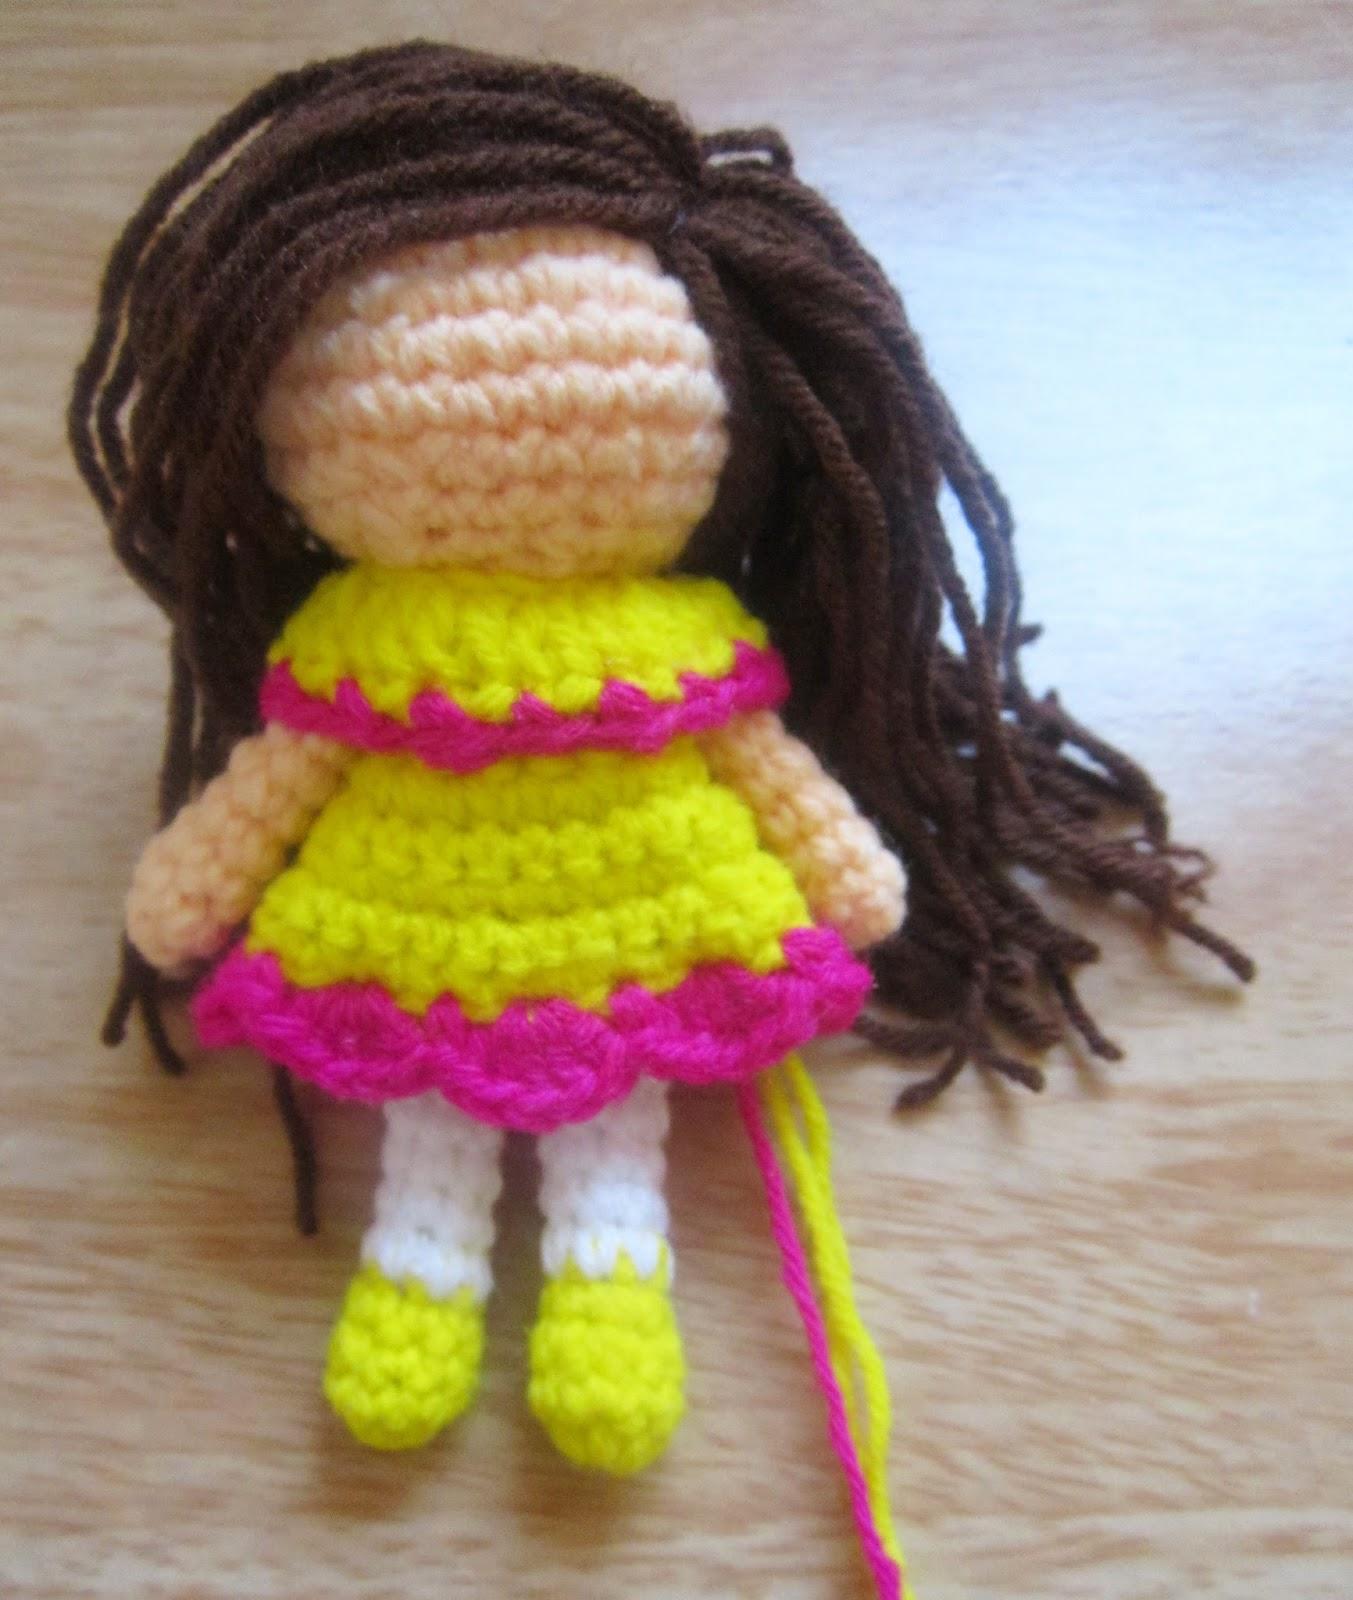 A little love everyday!: Little Amigurumi doll pattern.